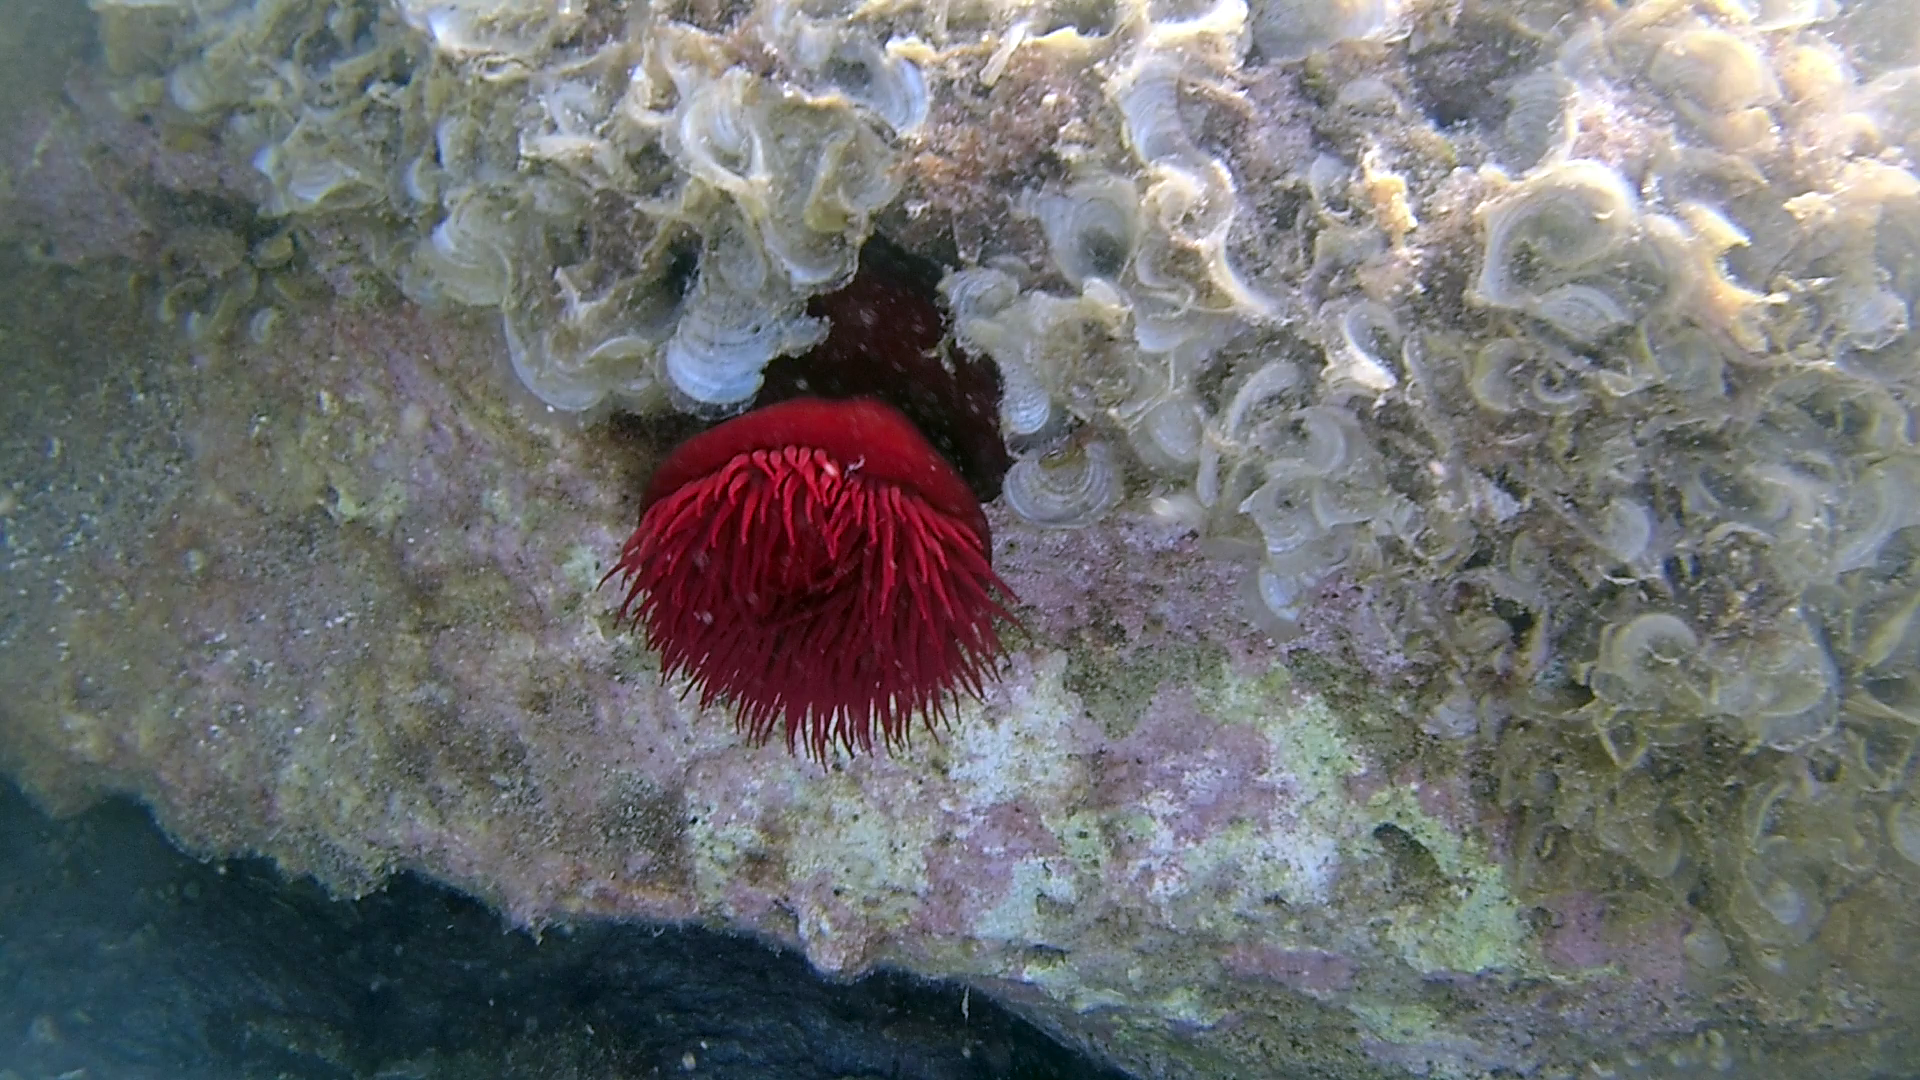 Il Pomodoro di mare - The beadlet Anemone - Actinia equina - intotheblue.it